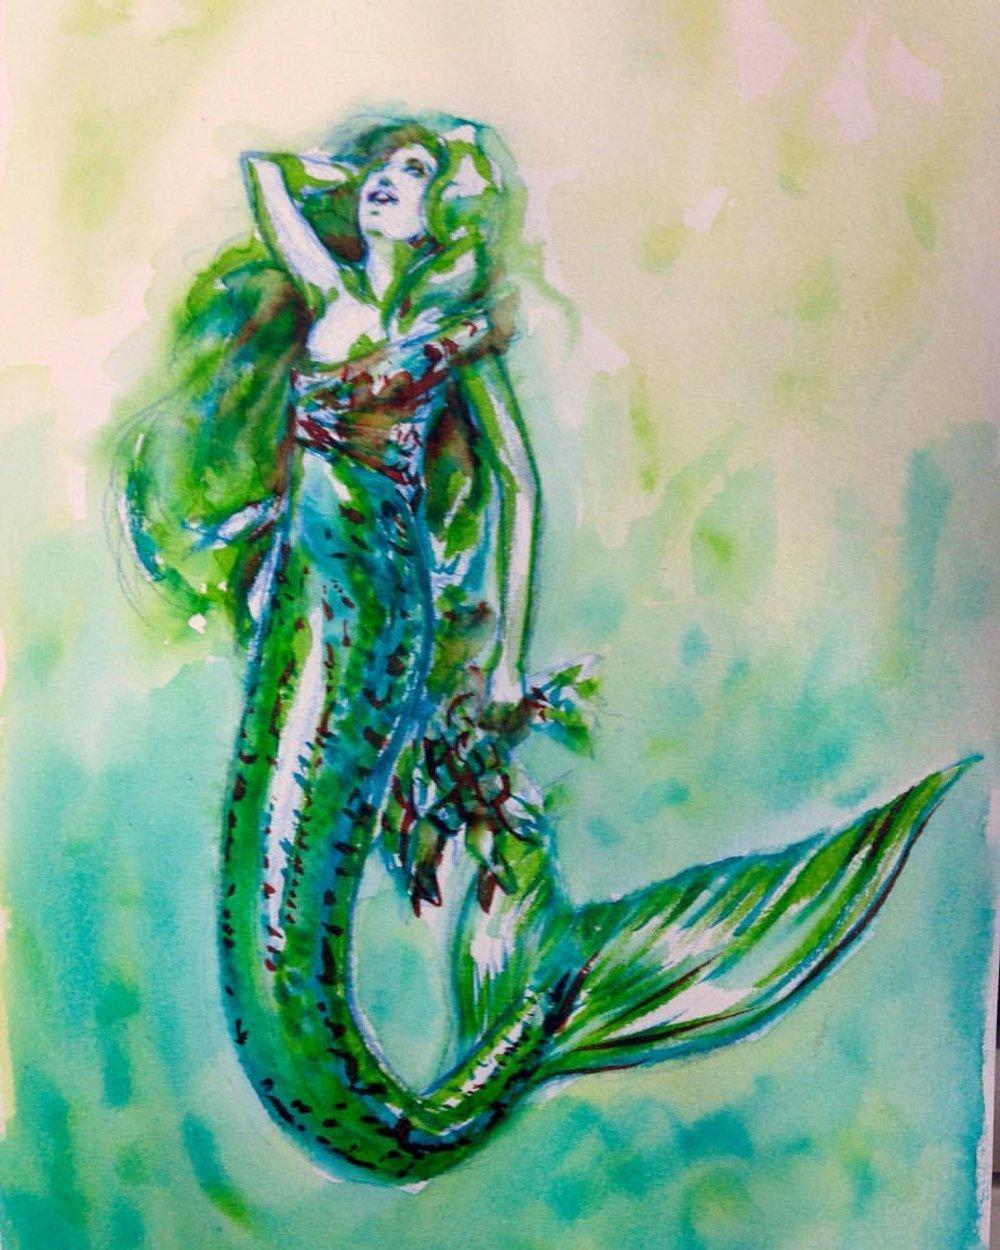 Mermaid enjoying the morning sun with her first catch of the day #mermay #mermaid #mermaidlife #green #sketch #2016 #belindaillustrates